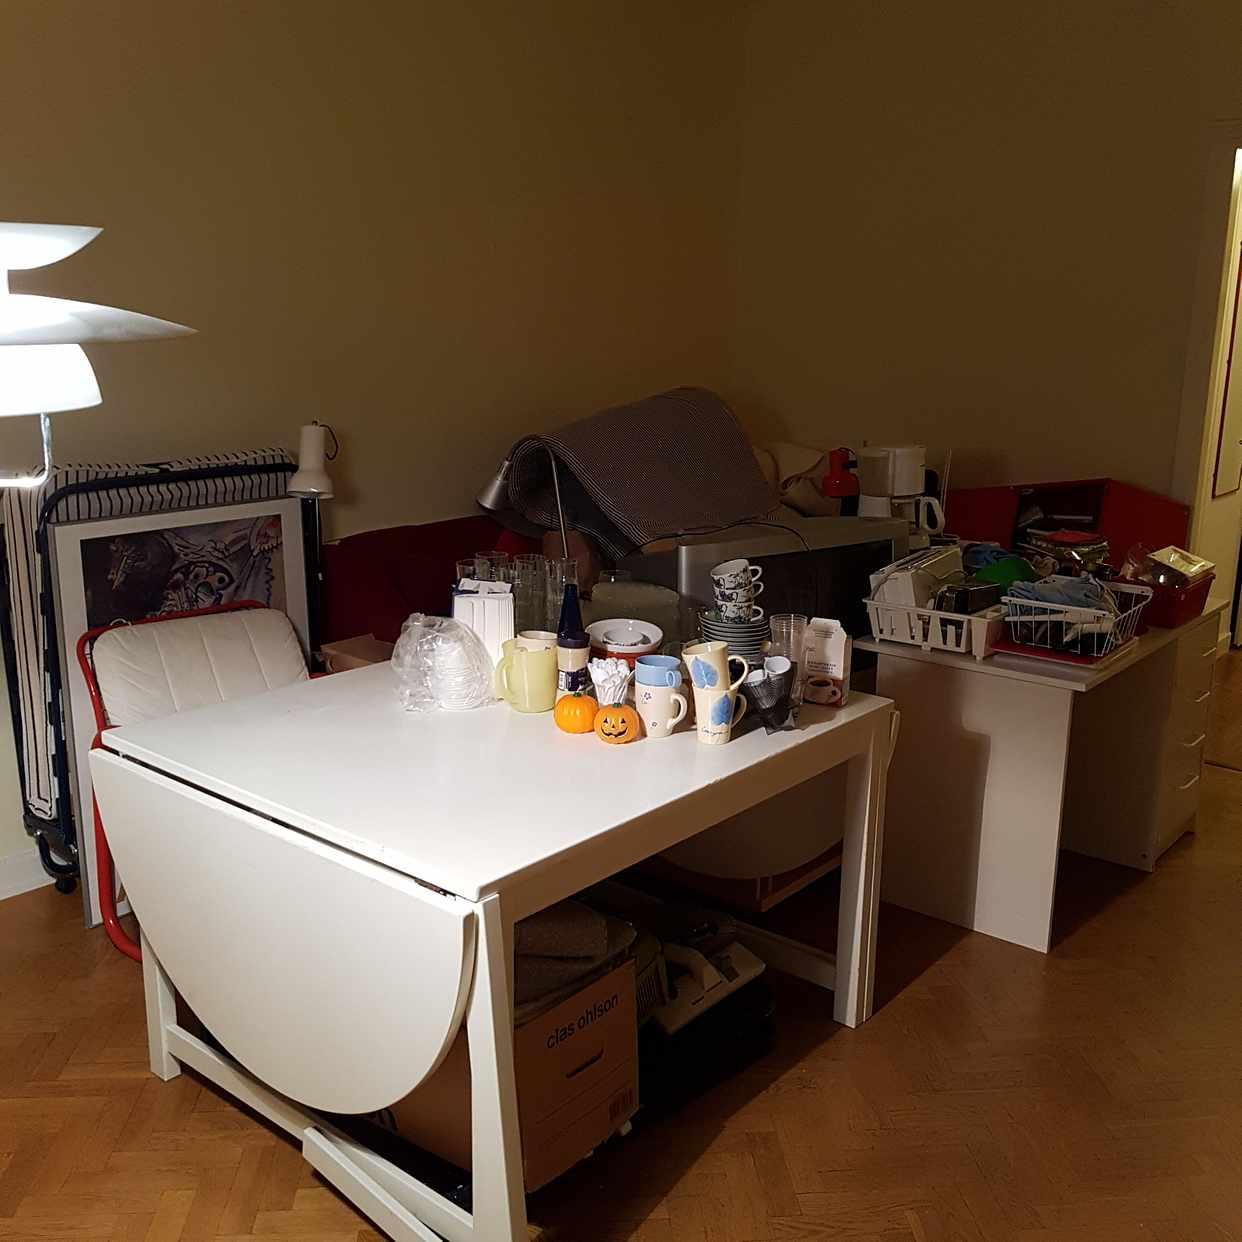 image of Furniture + kitchen stuff - Stockholm